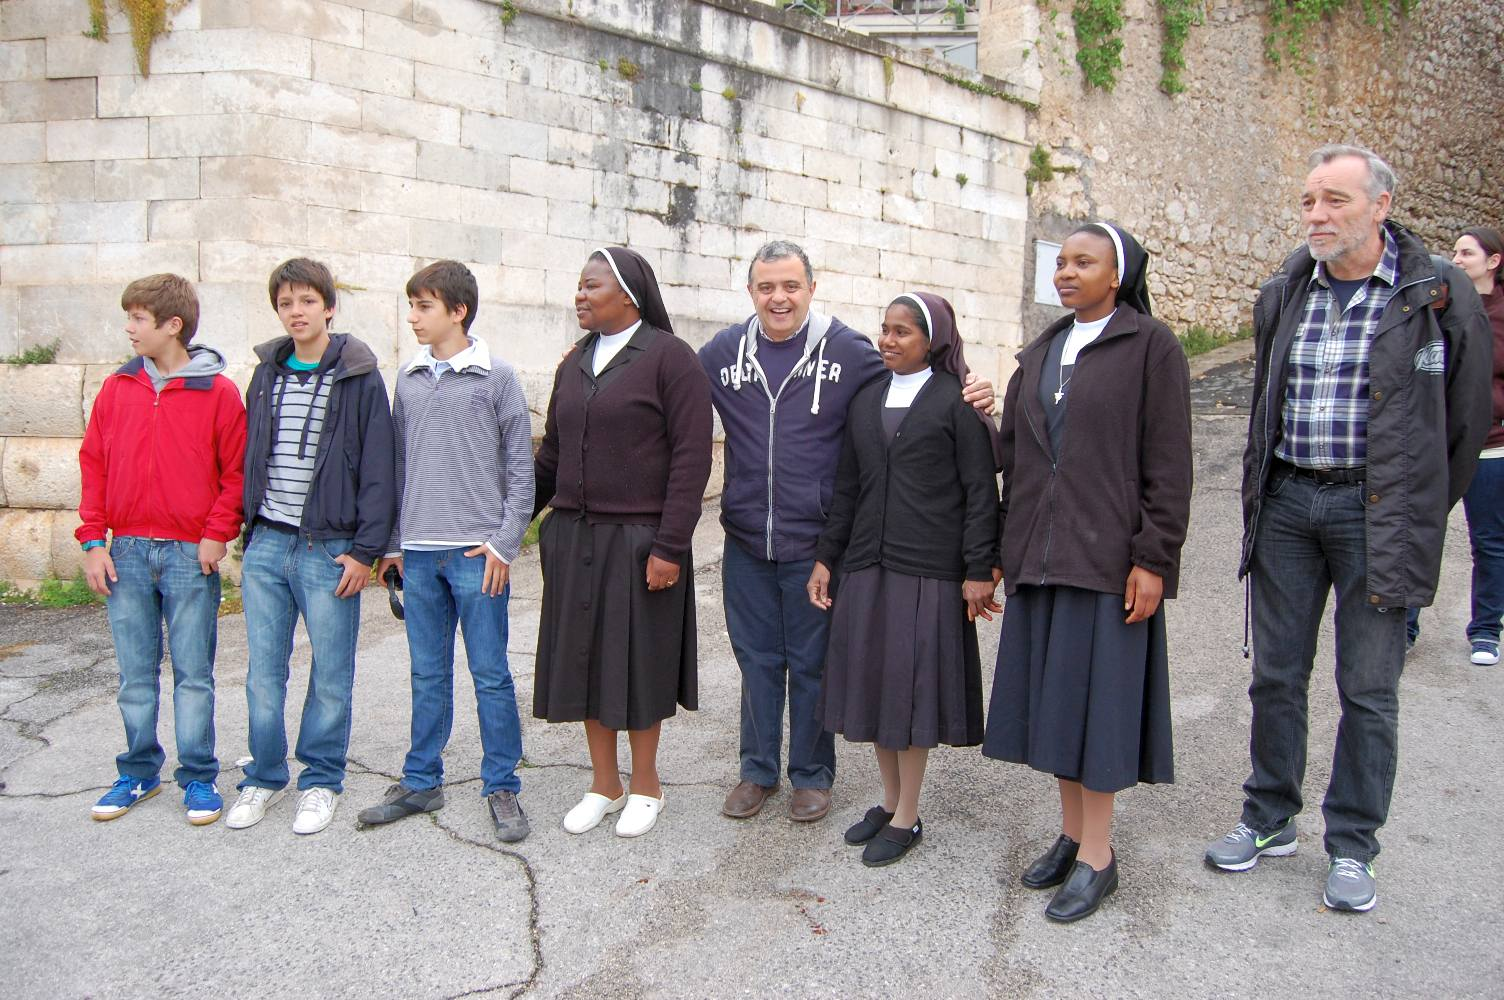 beatificacion_JPII_01_05_2011_028